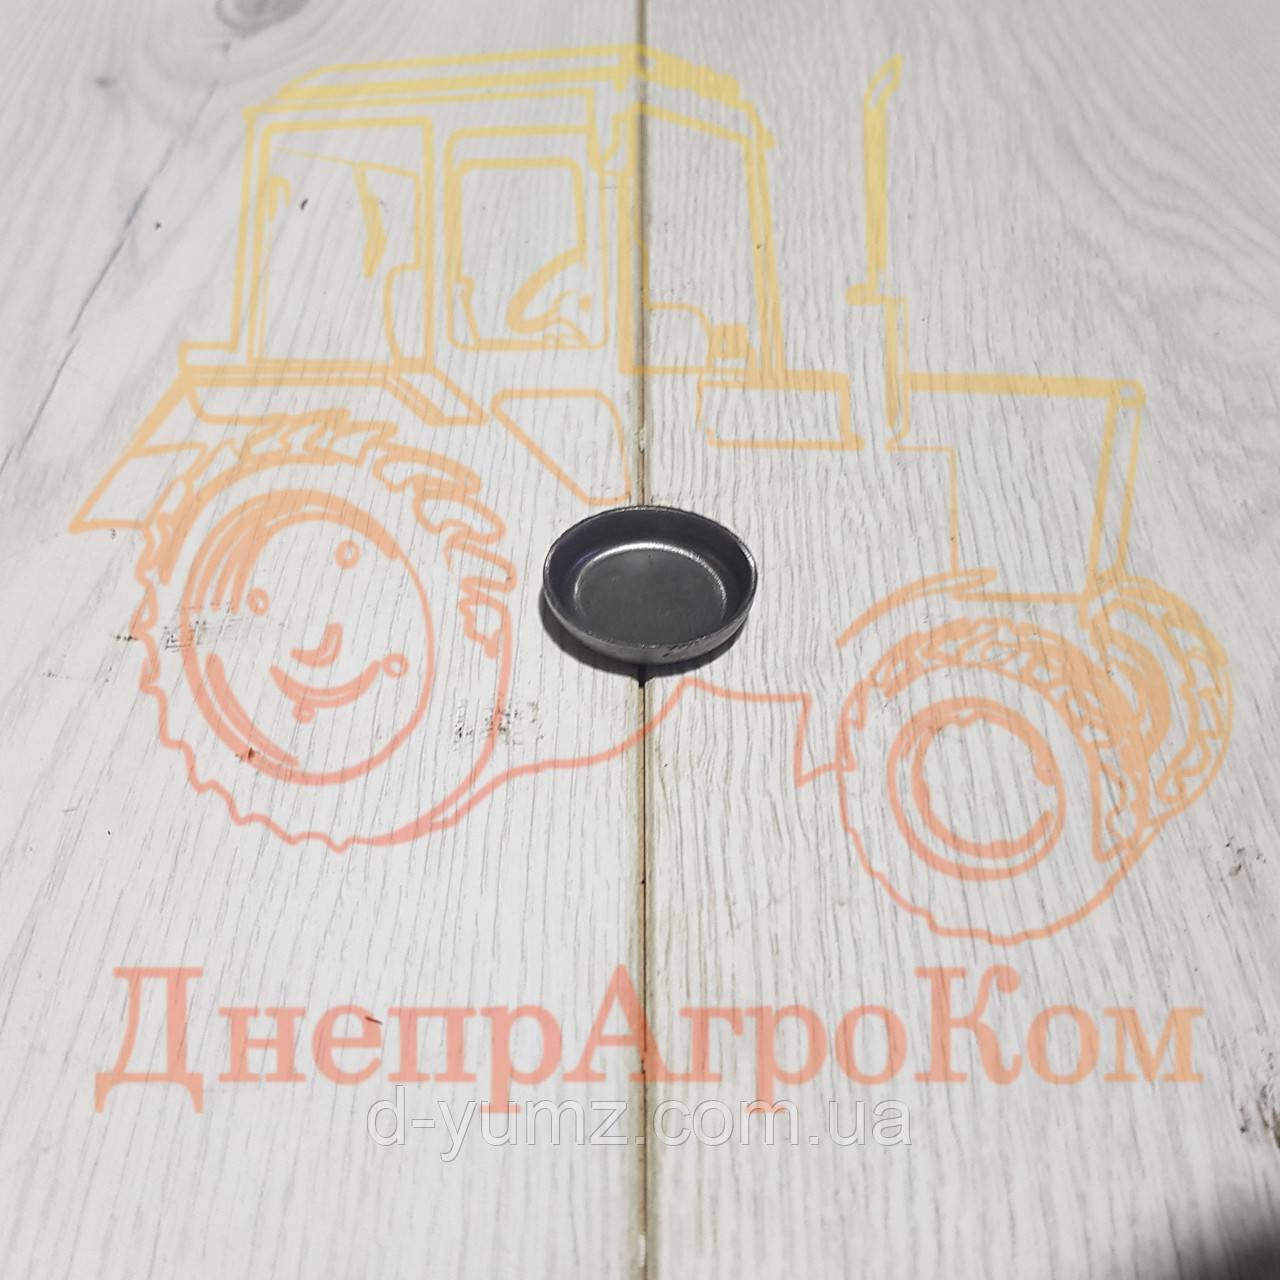 Заглушка головки блока ЮМЗ Д-65 верхняя 50-1003117